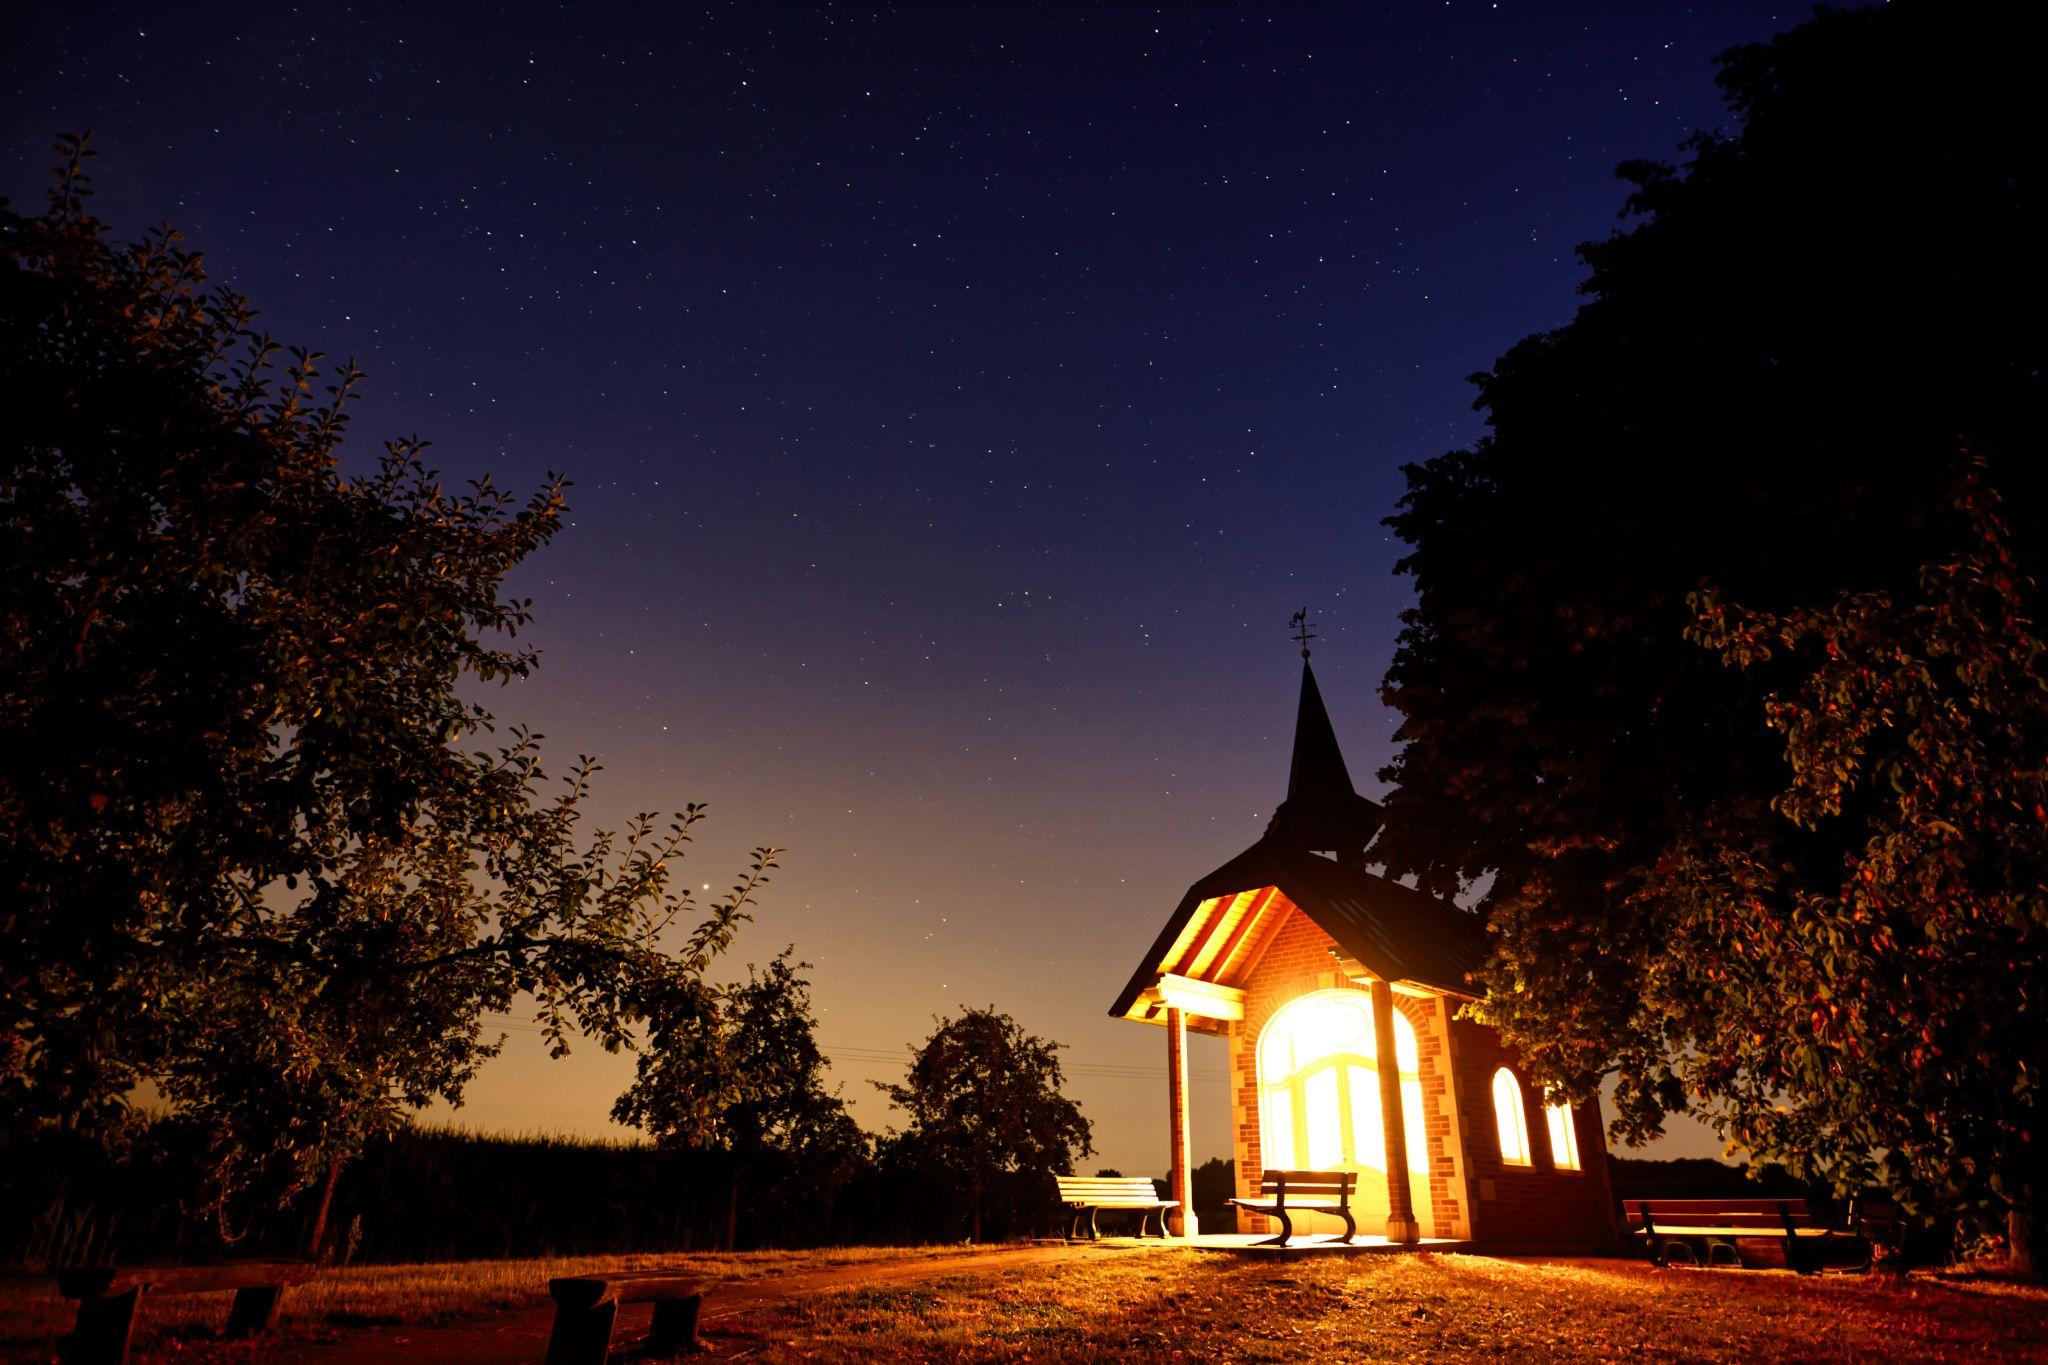 Kapelle zu den 5 Wunden, Germany